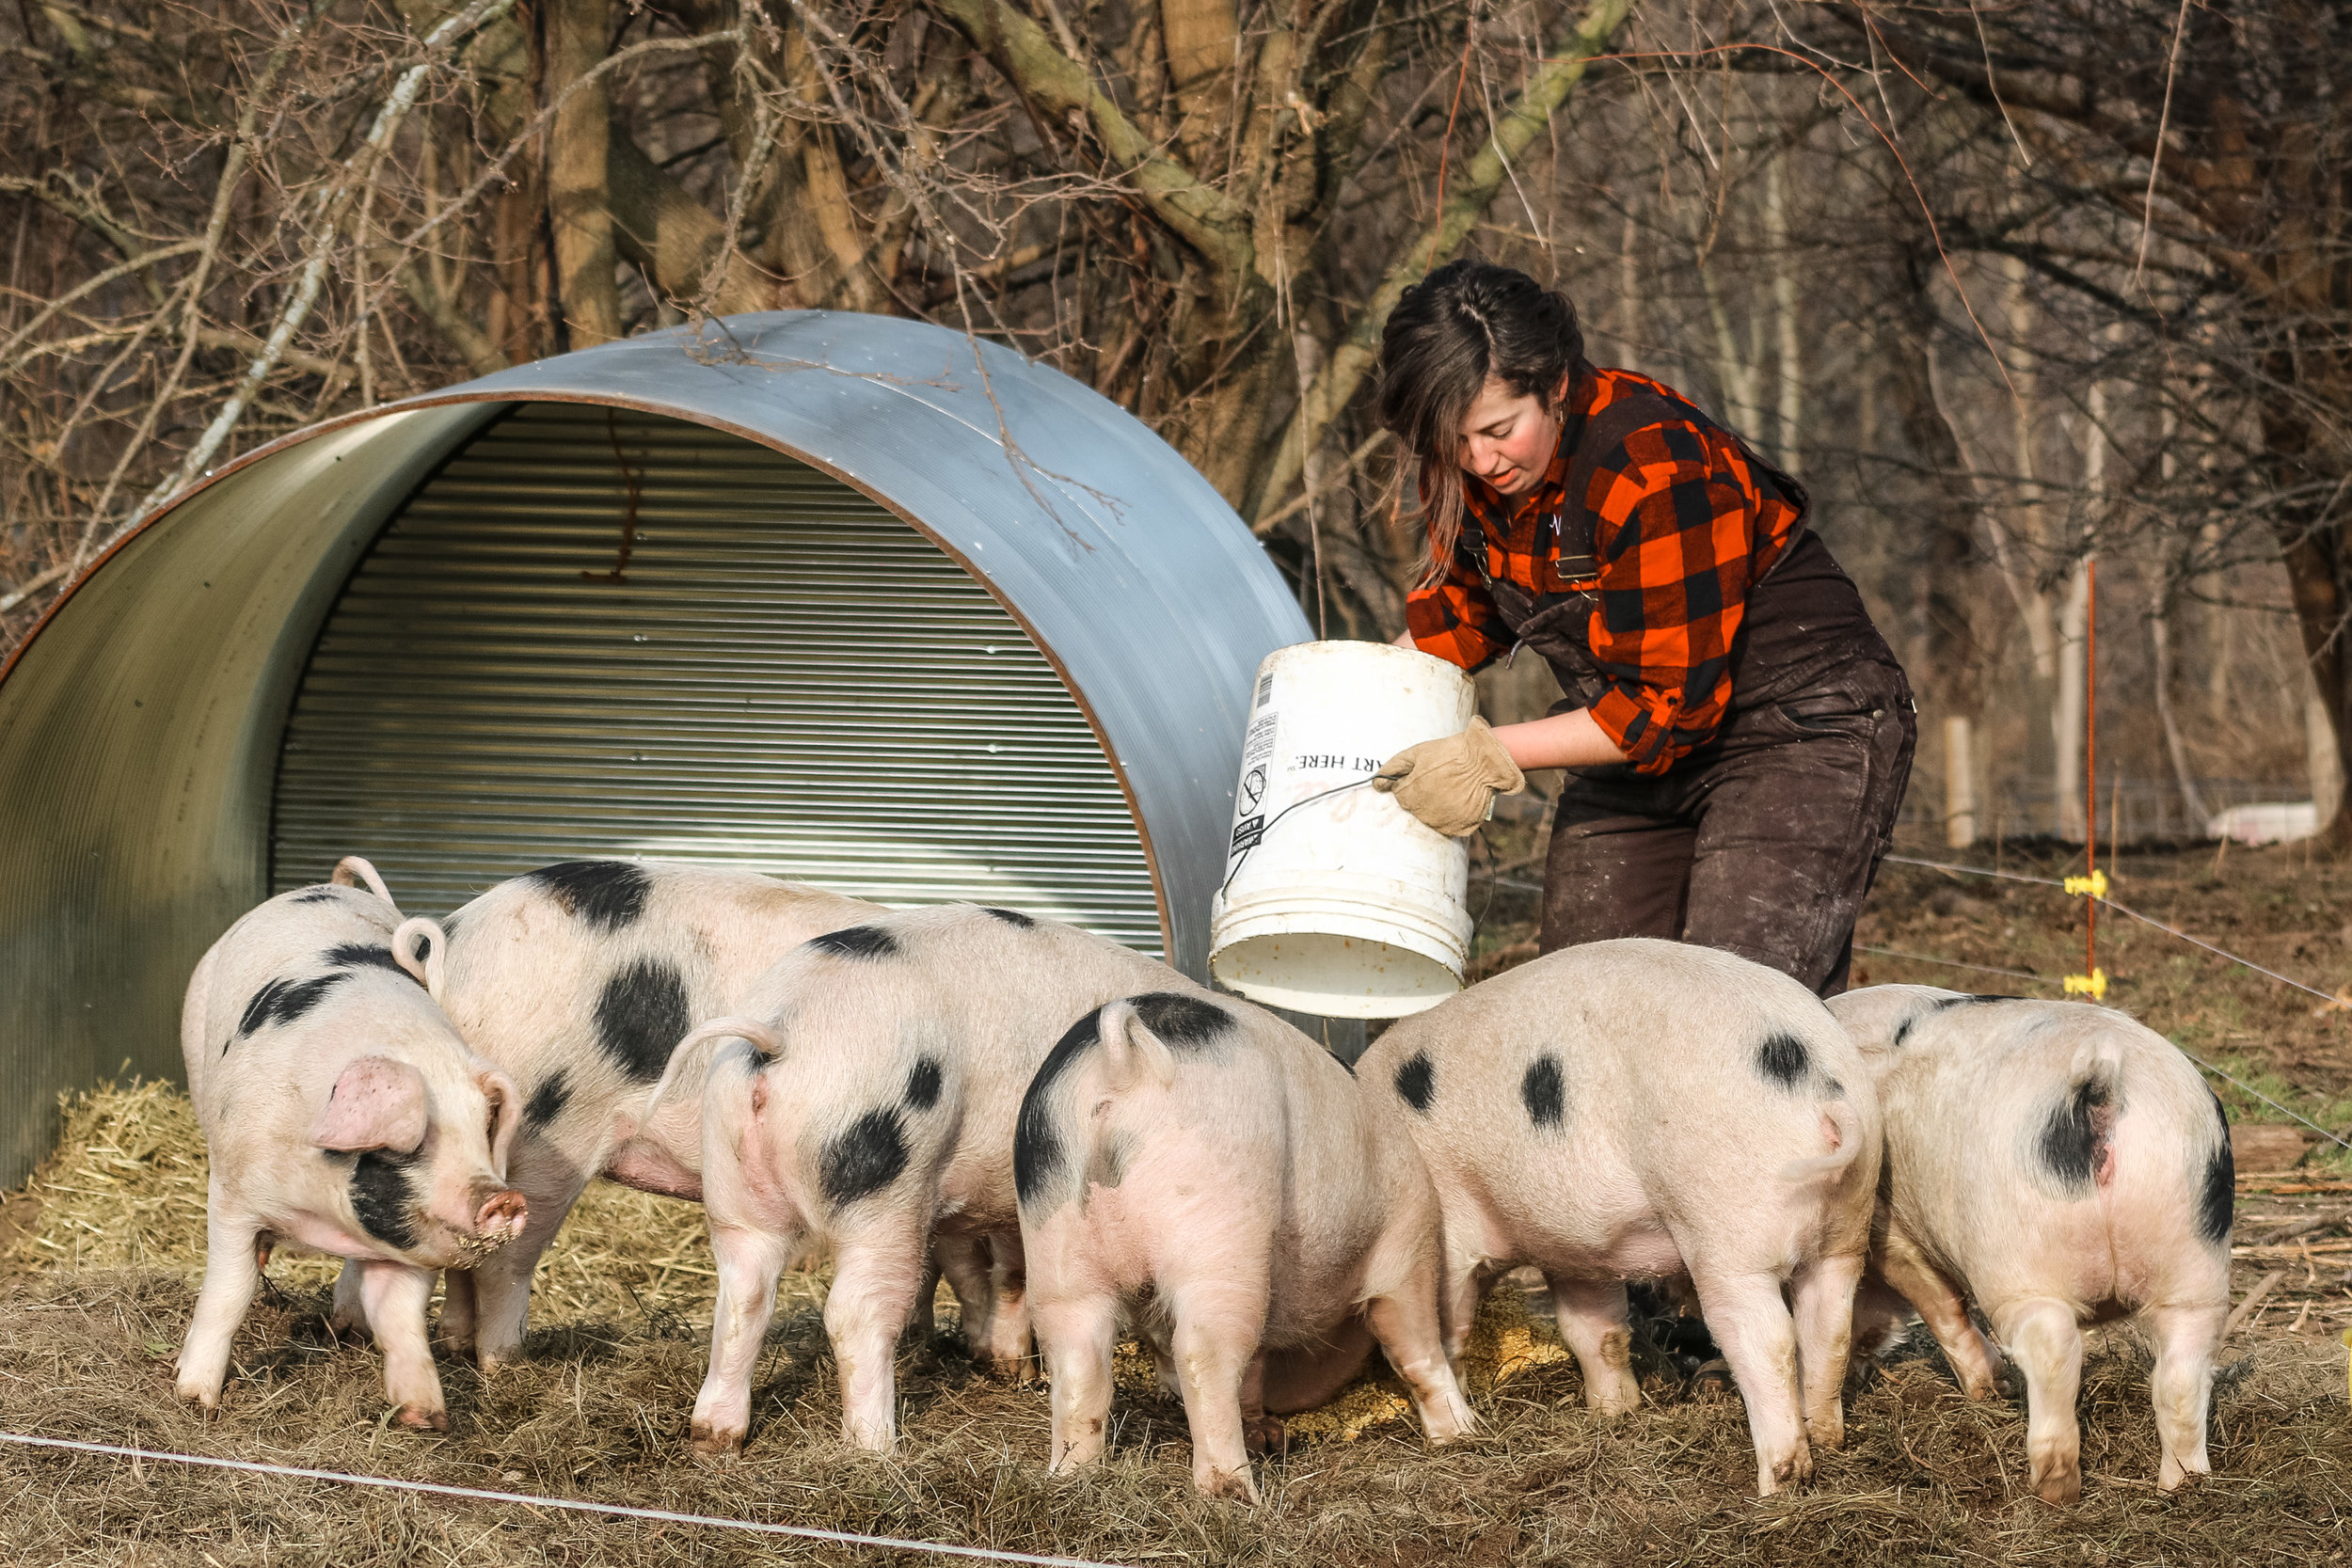 feeding pigs.jpg